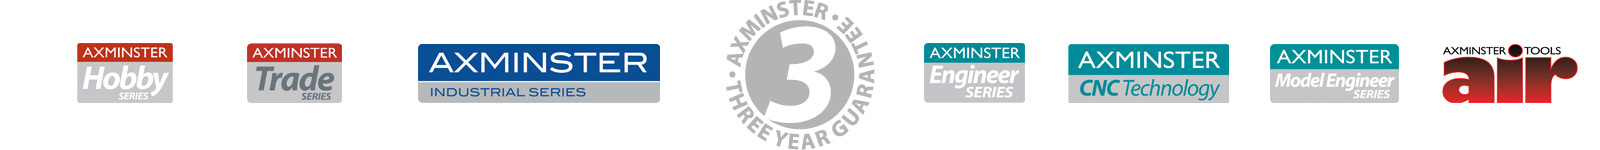 Axminster Three Year Guarantee